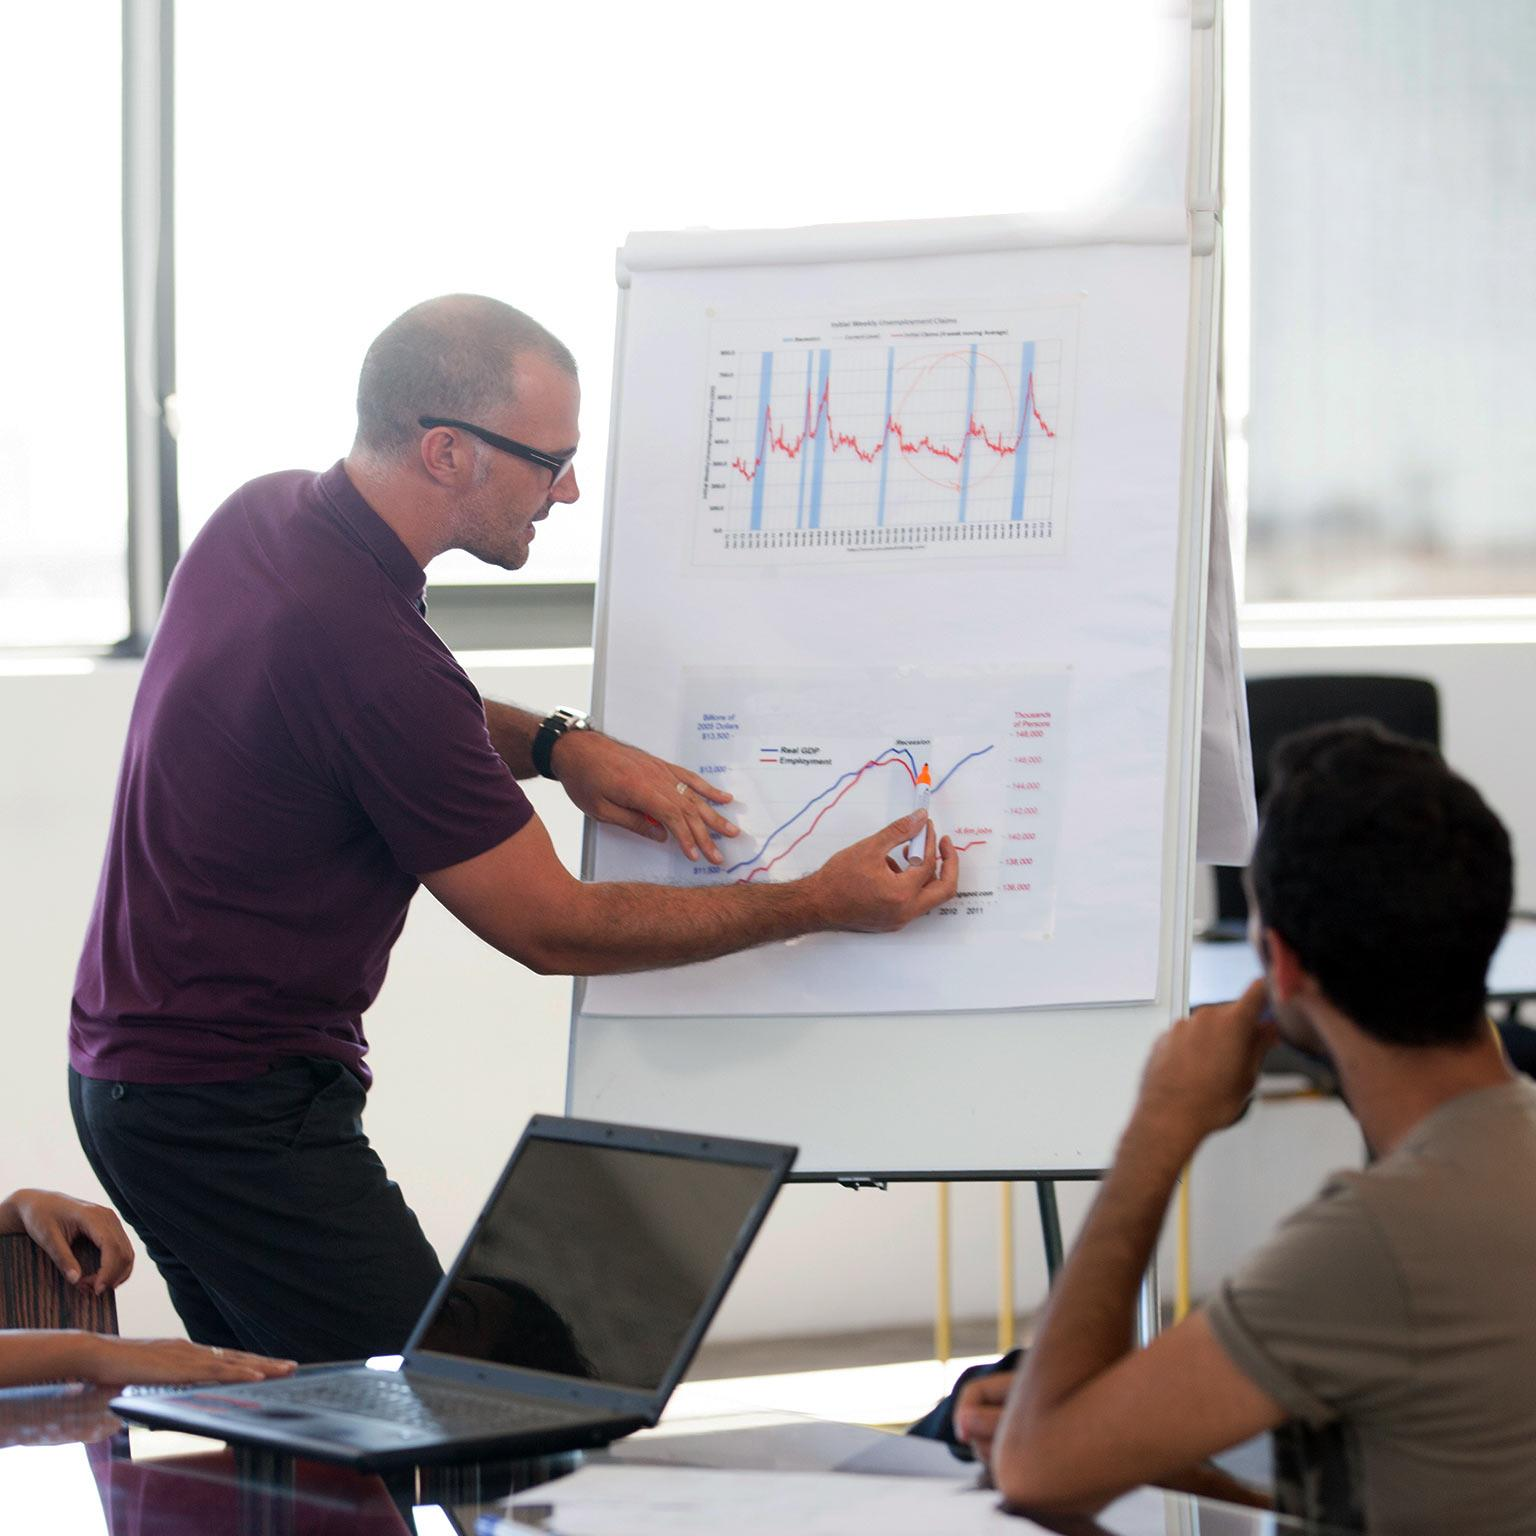 Digital strategy: Understanding the economics of disruption